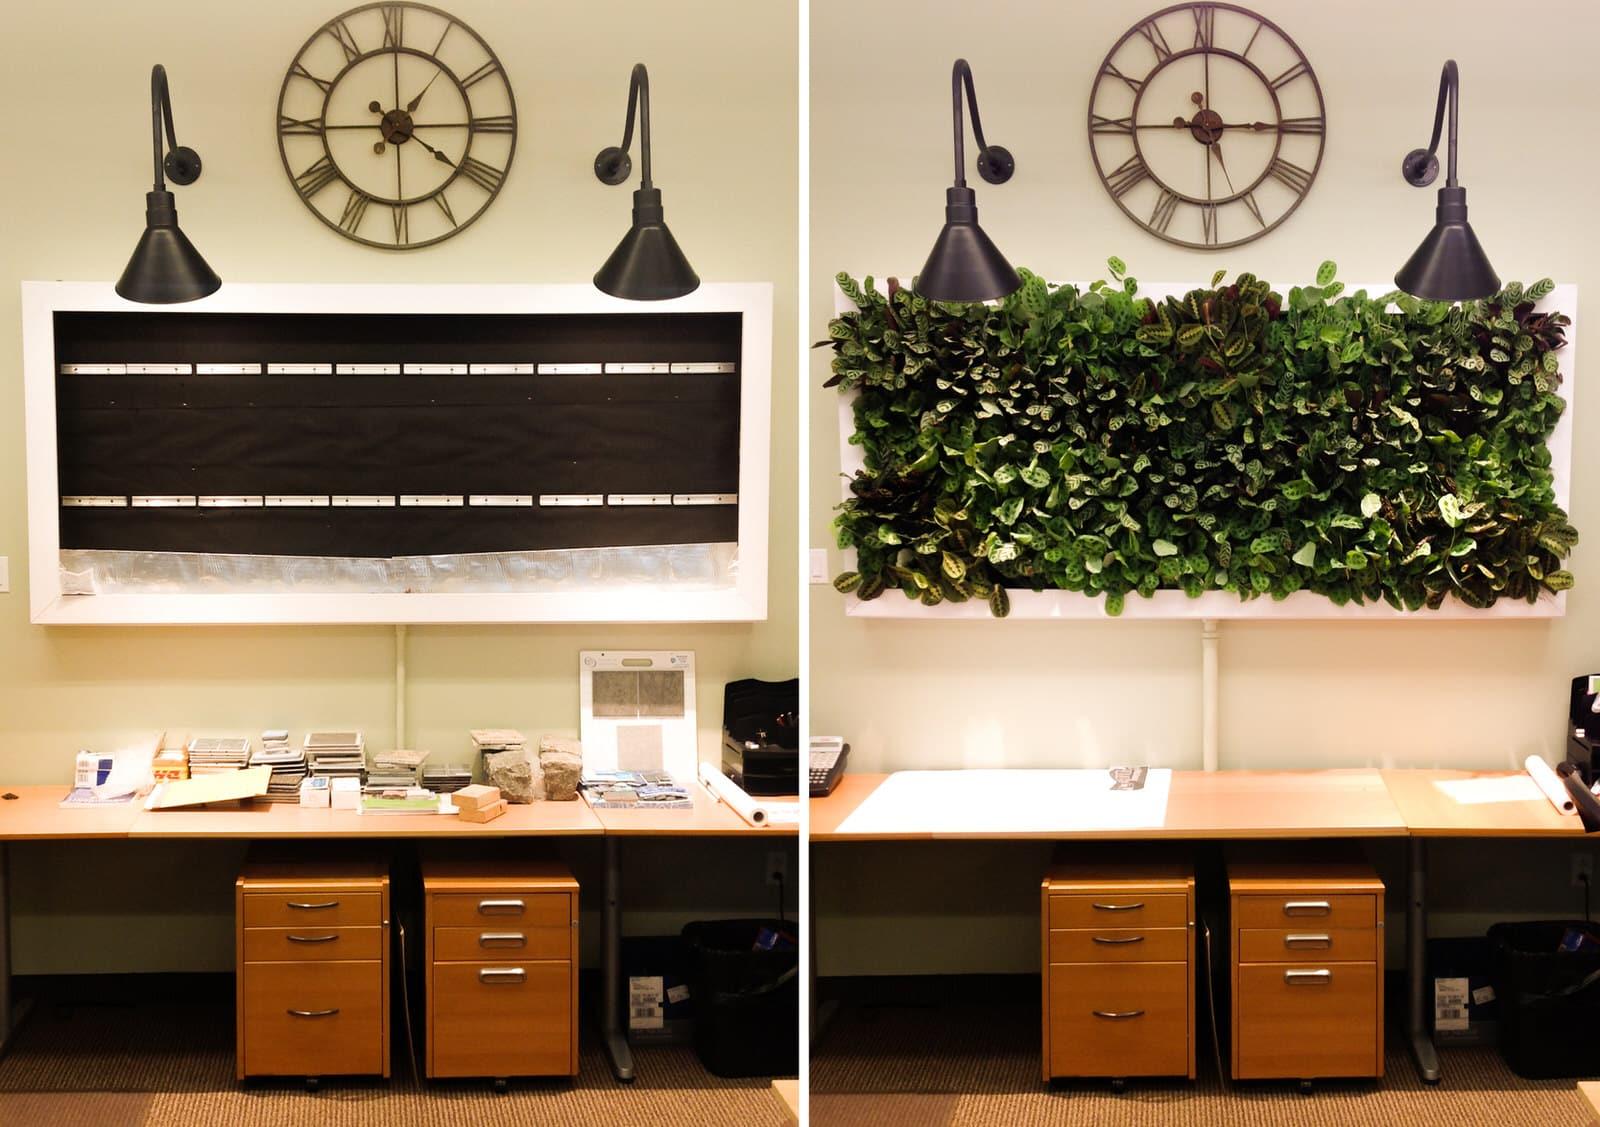 Greenwall - Office - Comparison